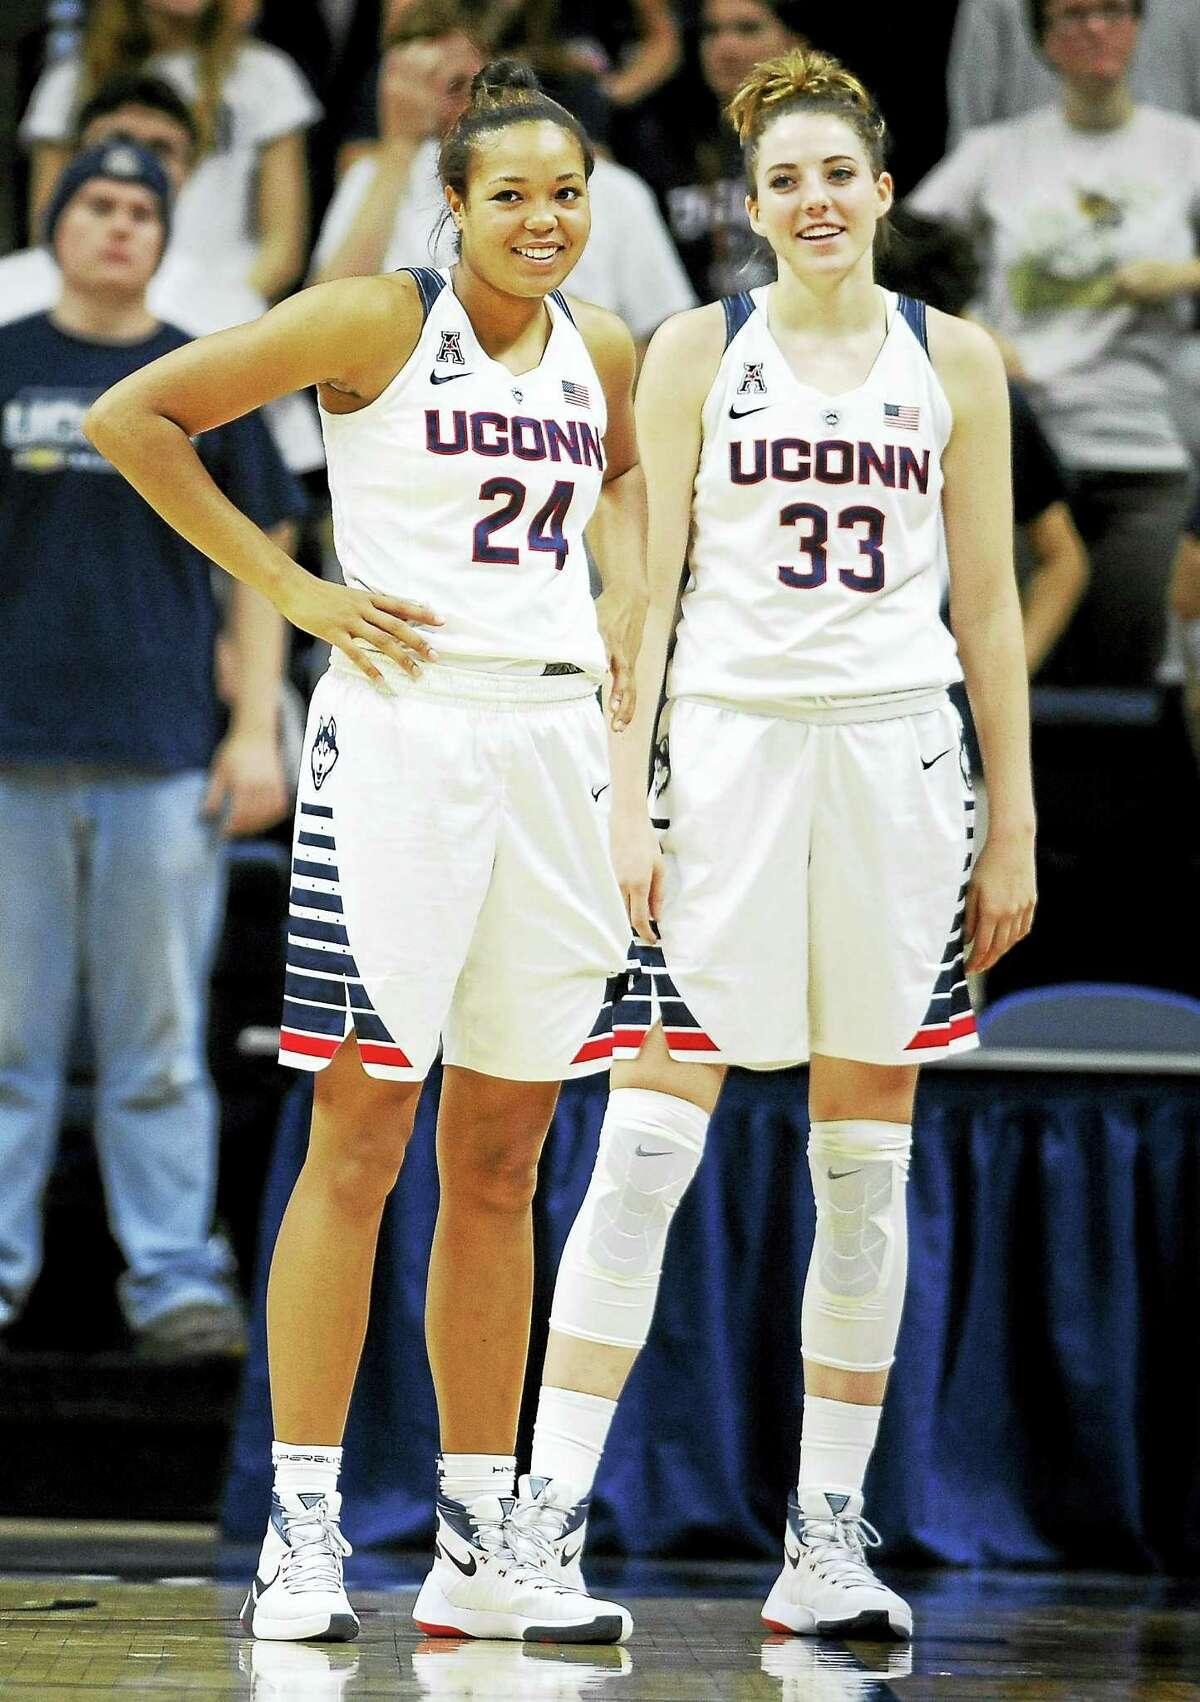 UConn freshmen Napheesa Collier, left, and Katie Lou Samuelson.